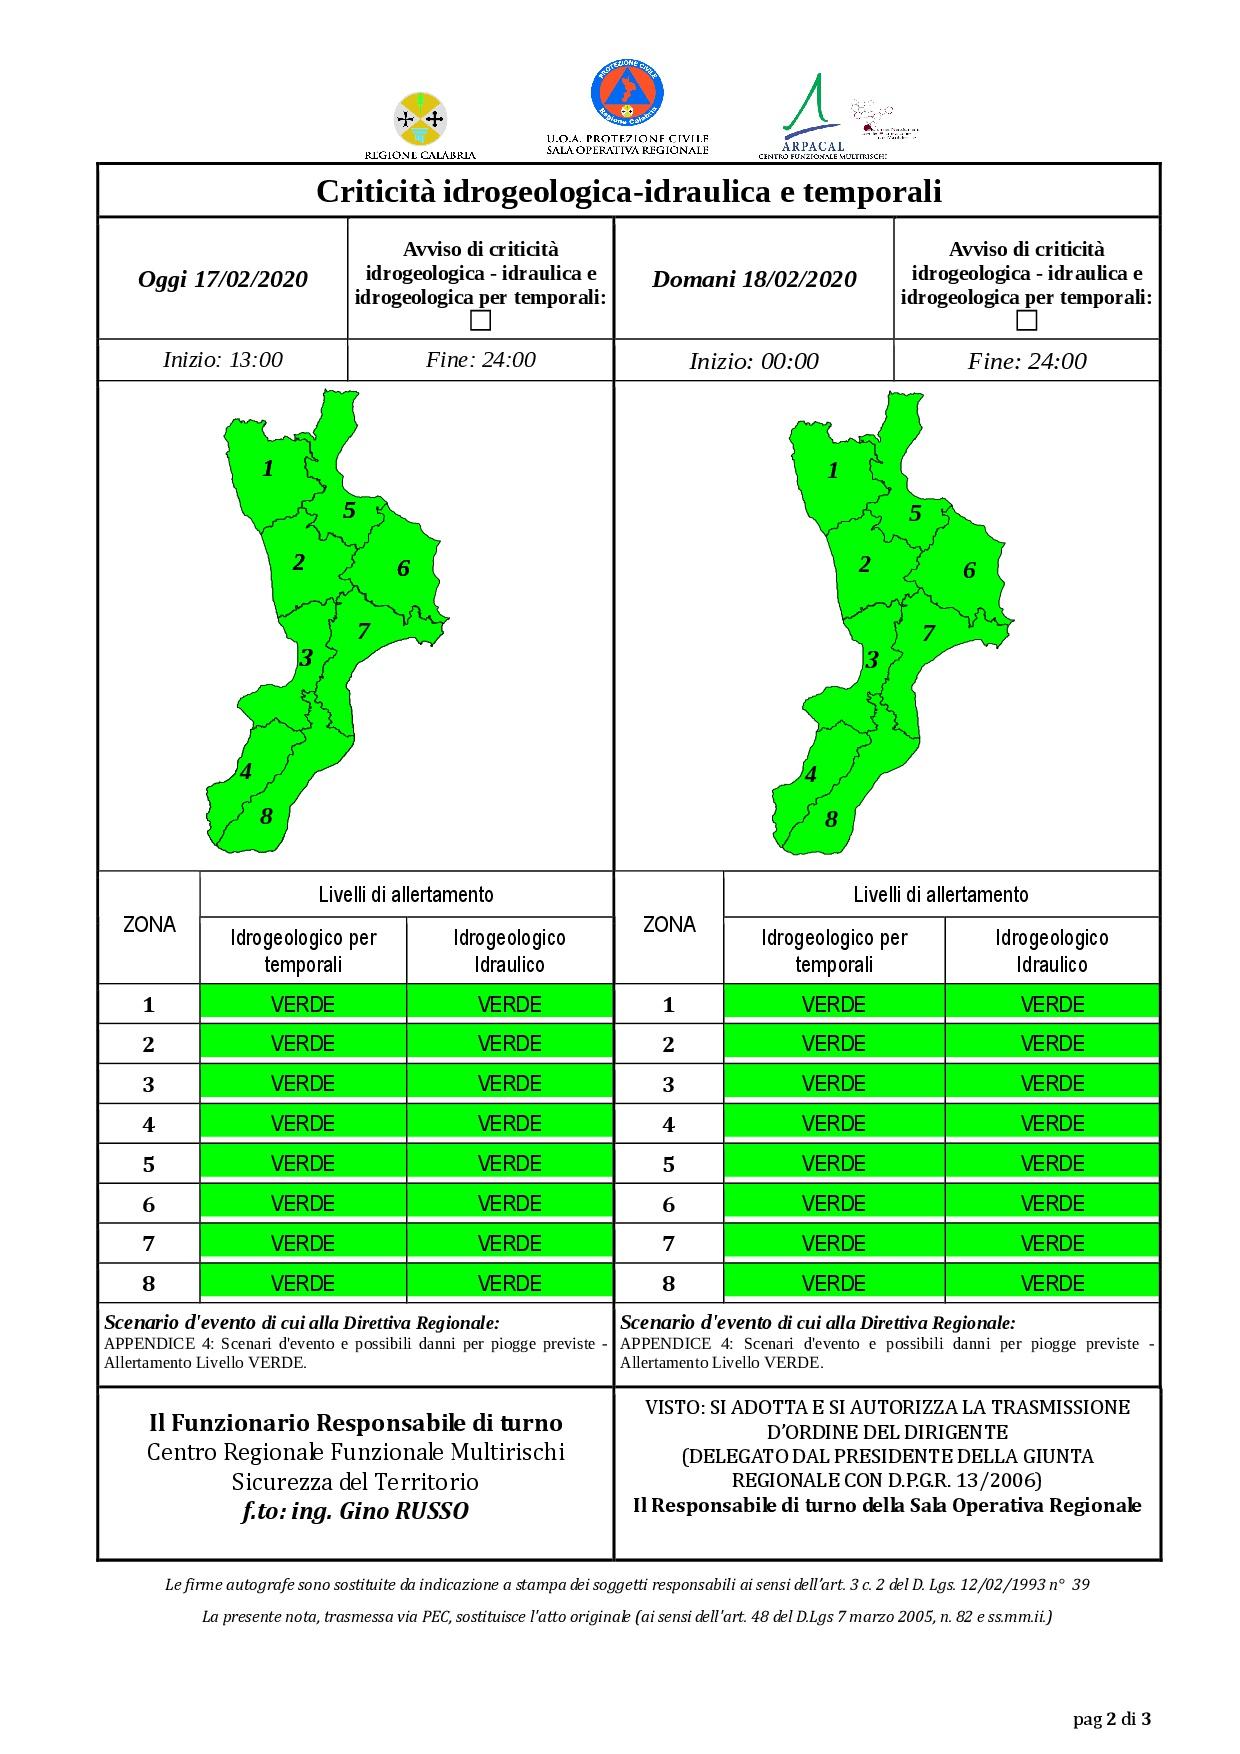 Criticità idrogeologica-idraulica e temporali in Calabria 17-02-2020